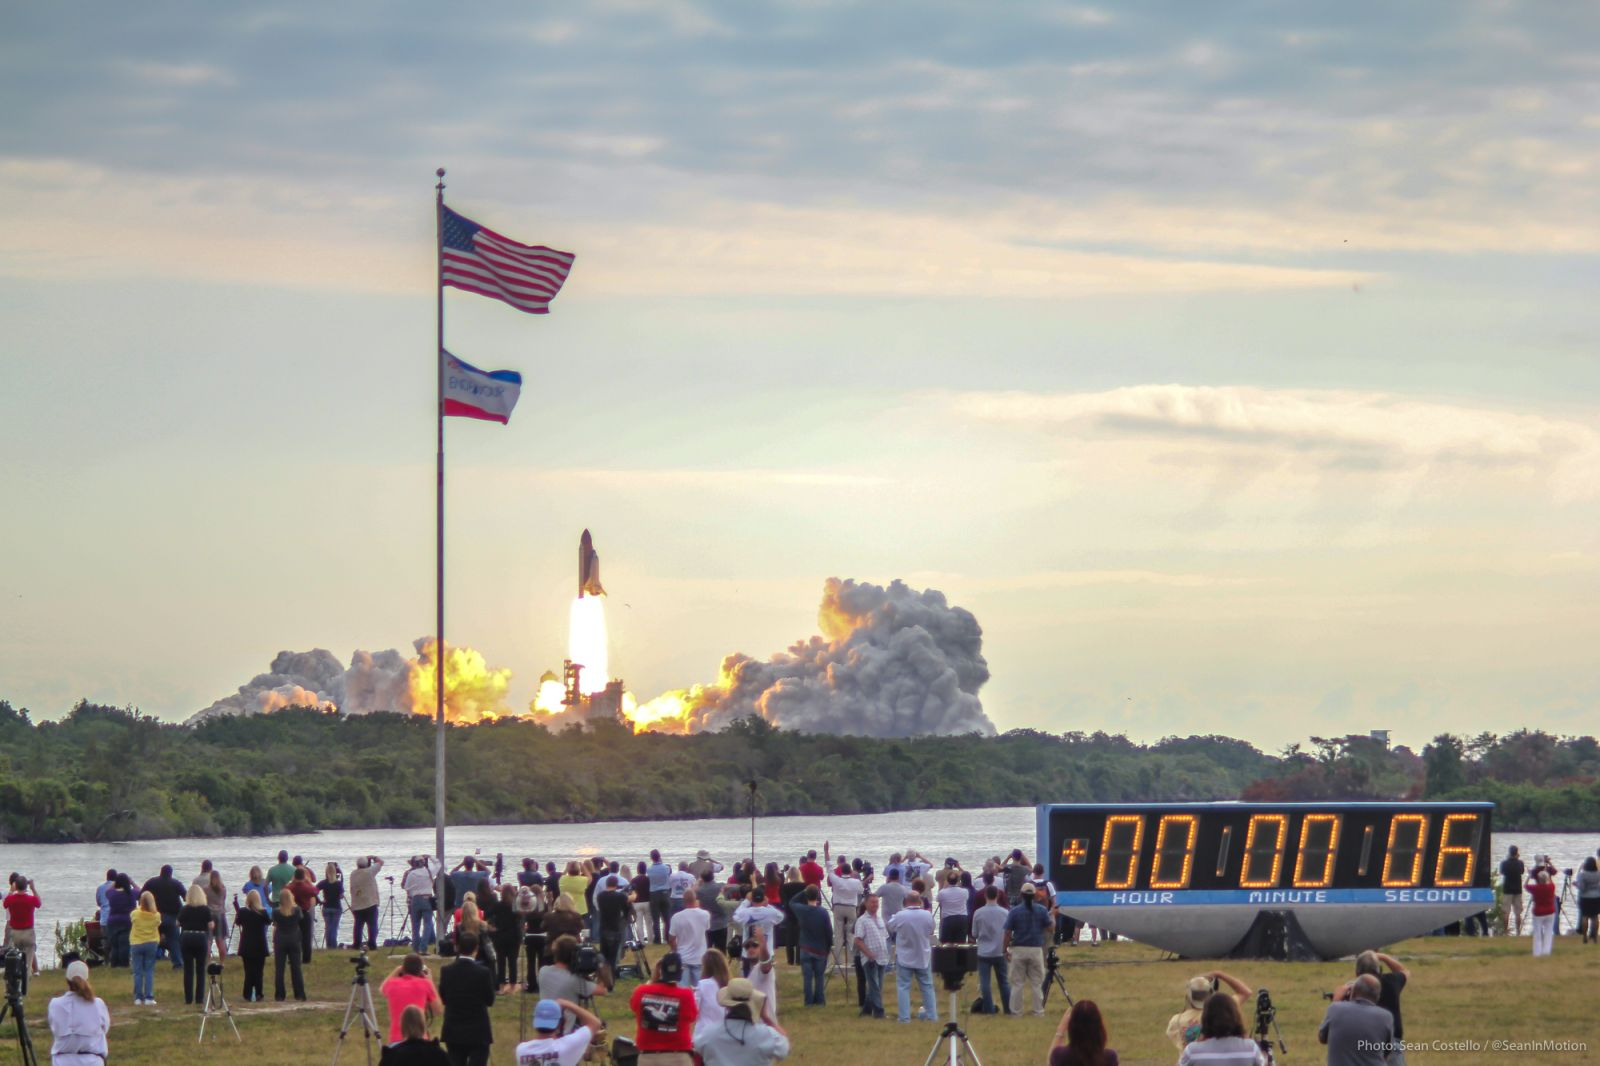 STS-134 Endeavour Launch